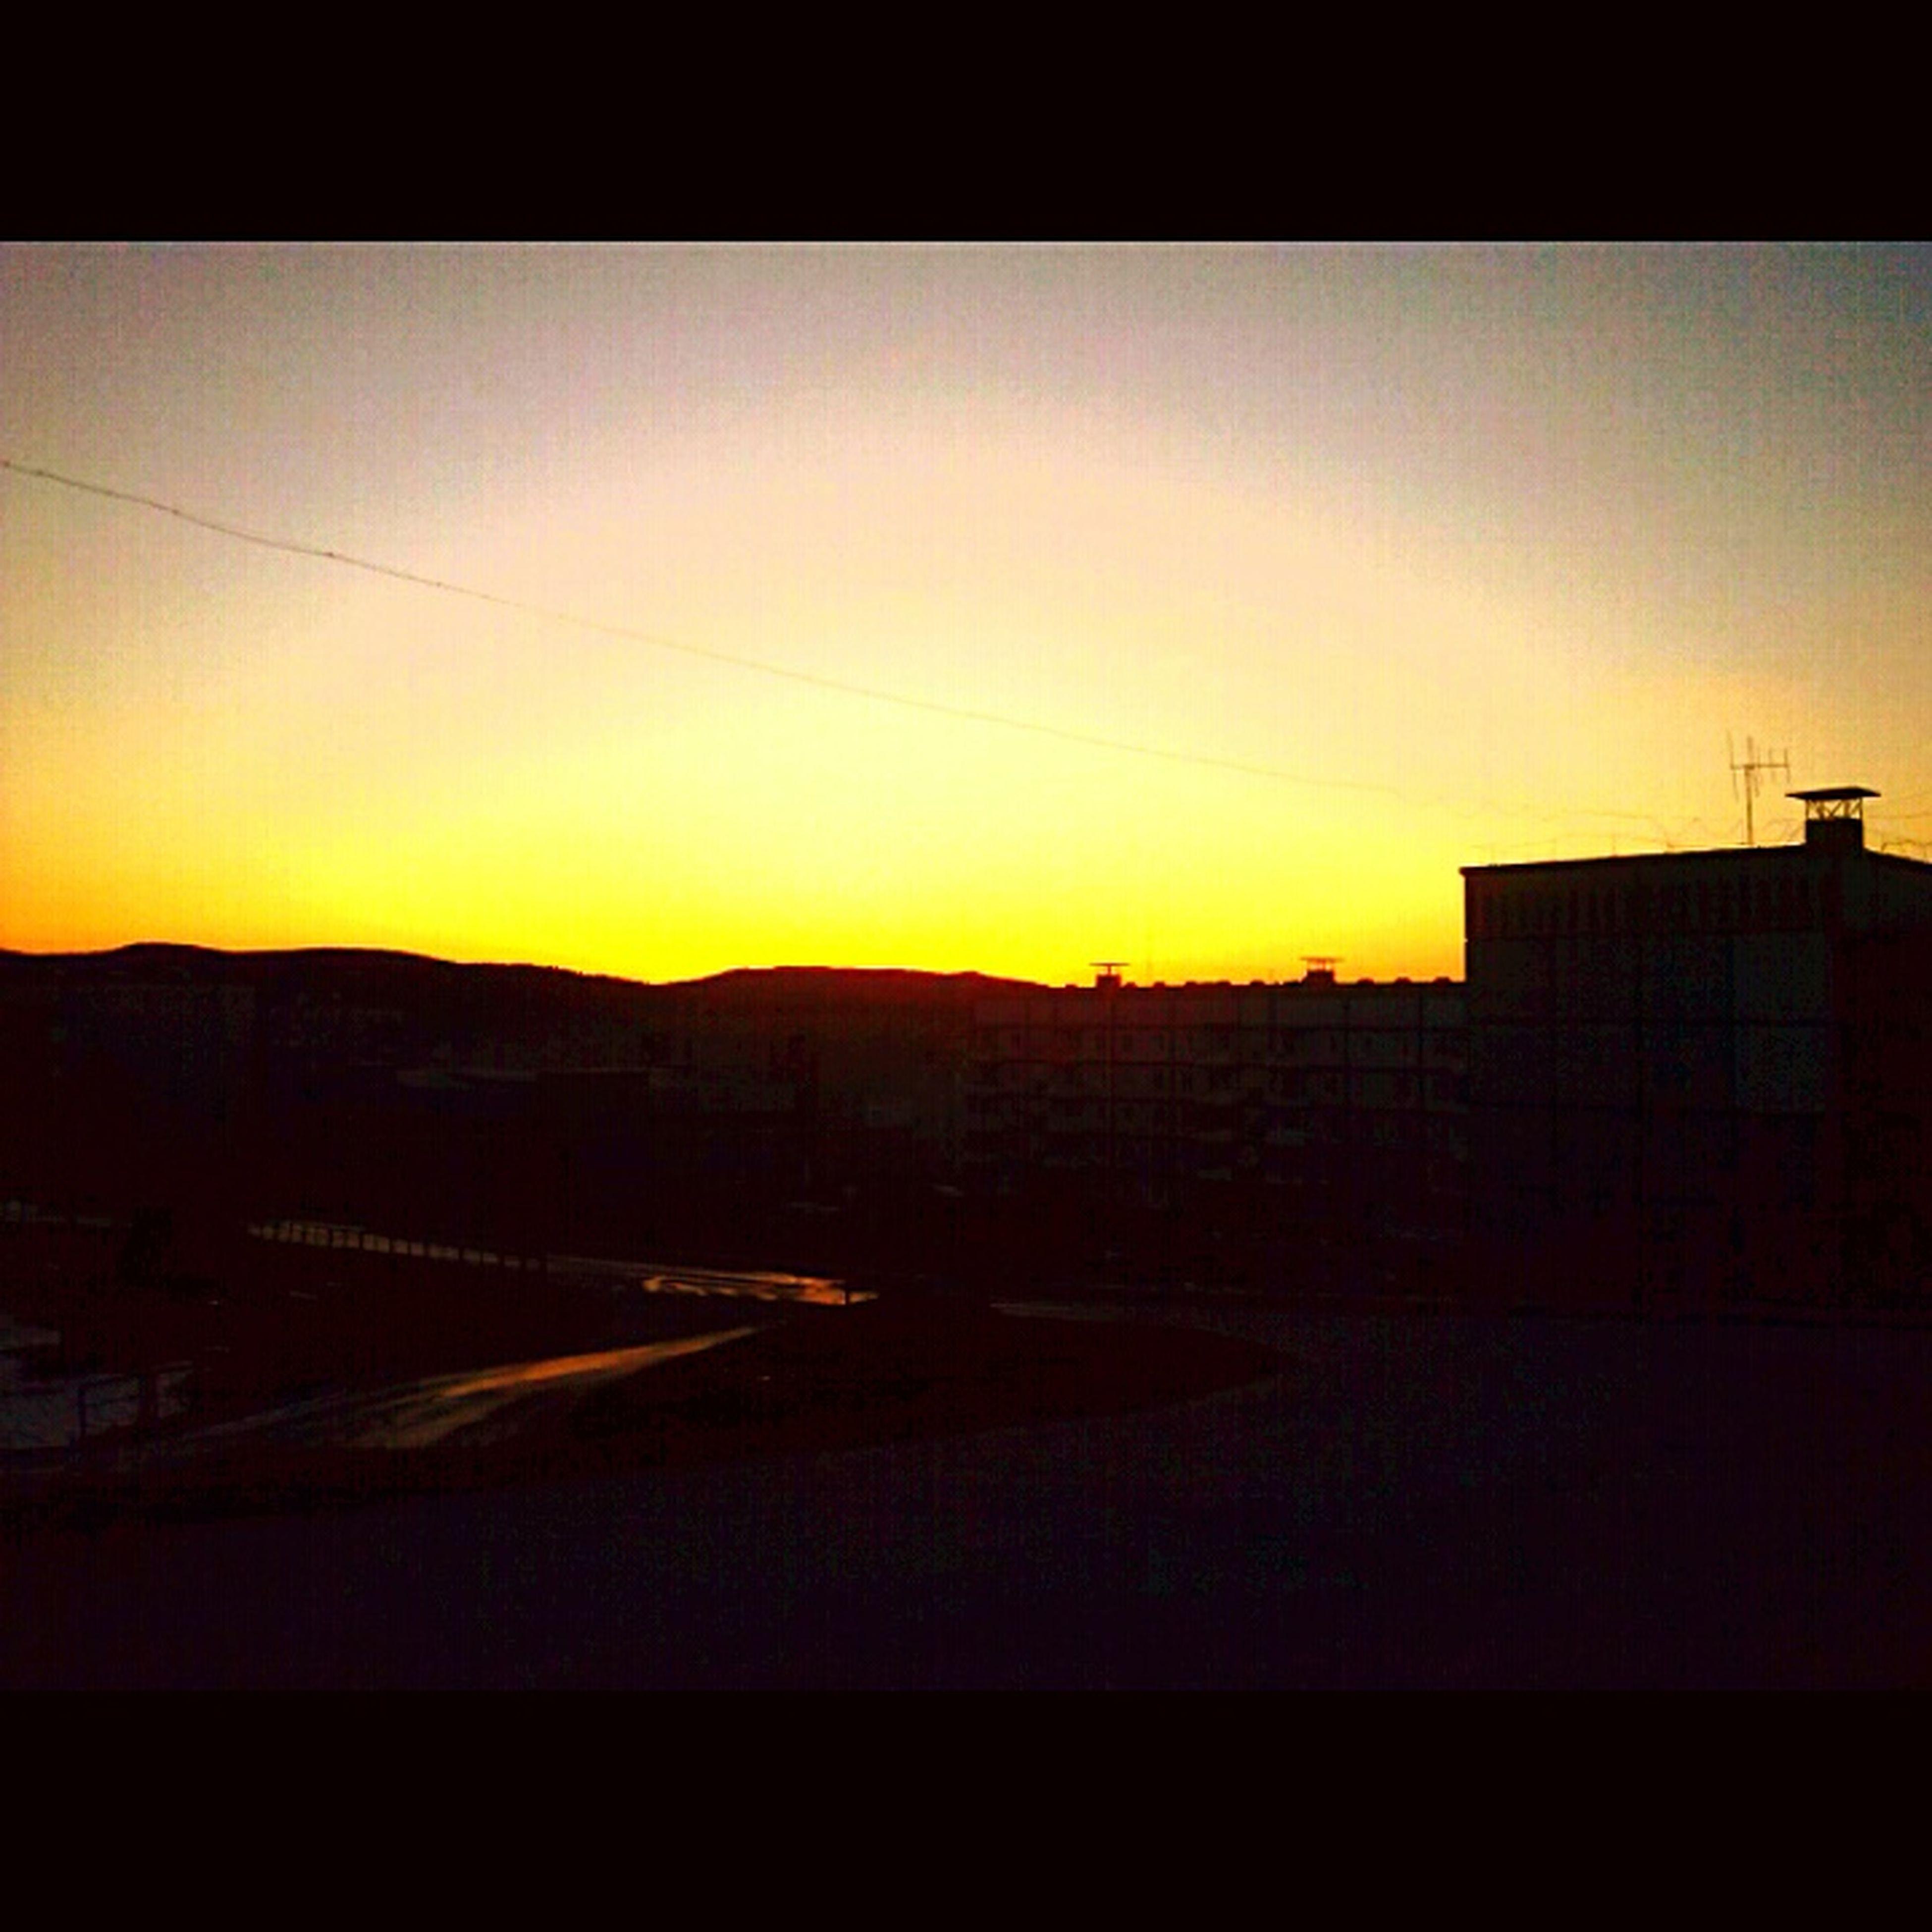 sunset, transfer print, building exterior, built structure, silhouette, orange color, architecture, sky, copy space, auto post production filter, clear sky, transportation, dusk, house, outdoors, no people, dark, nature, power line, sunlight